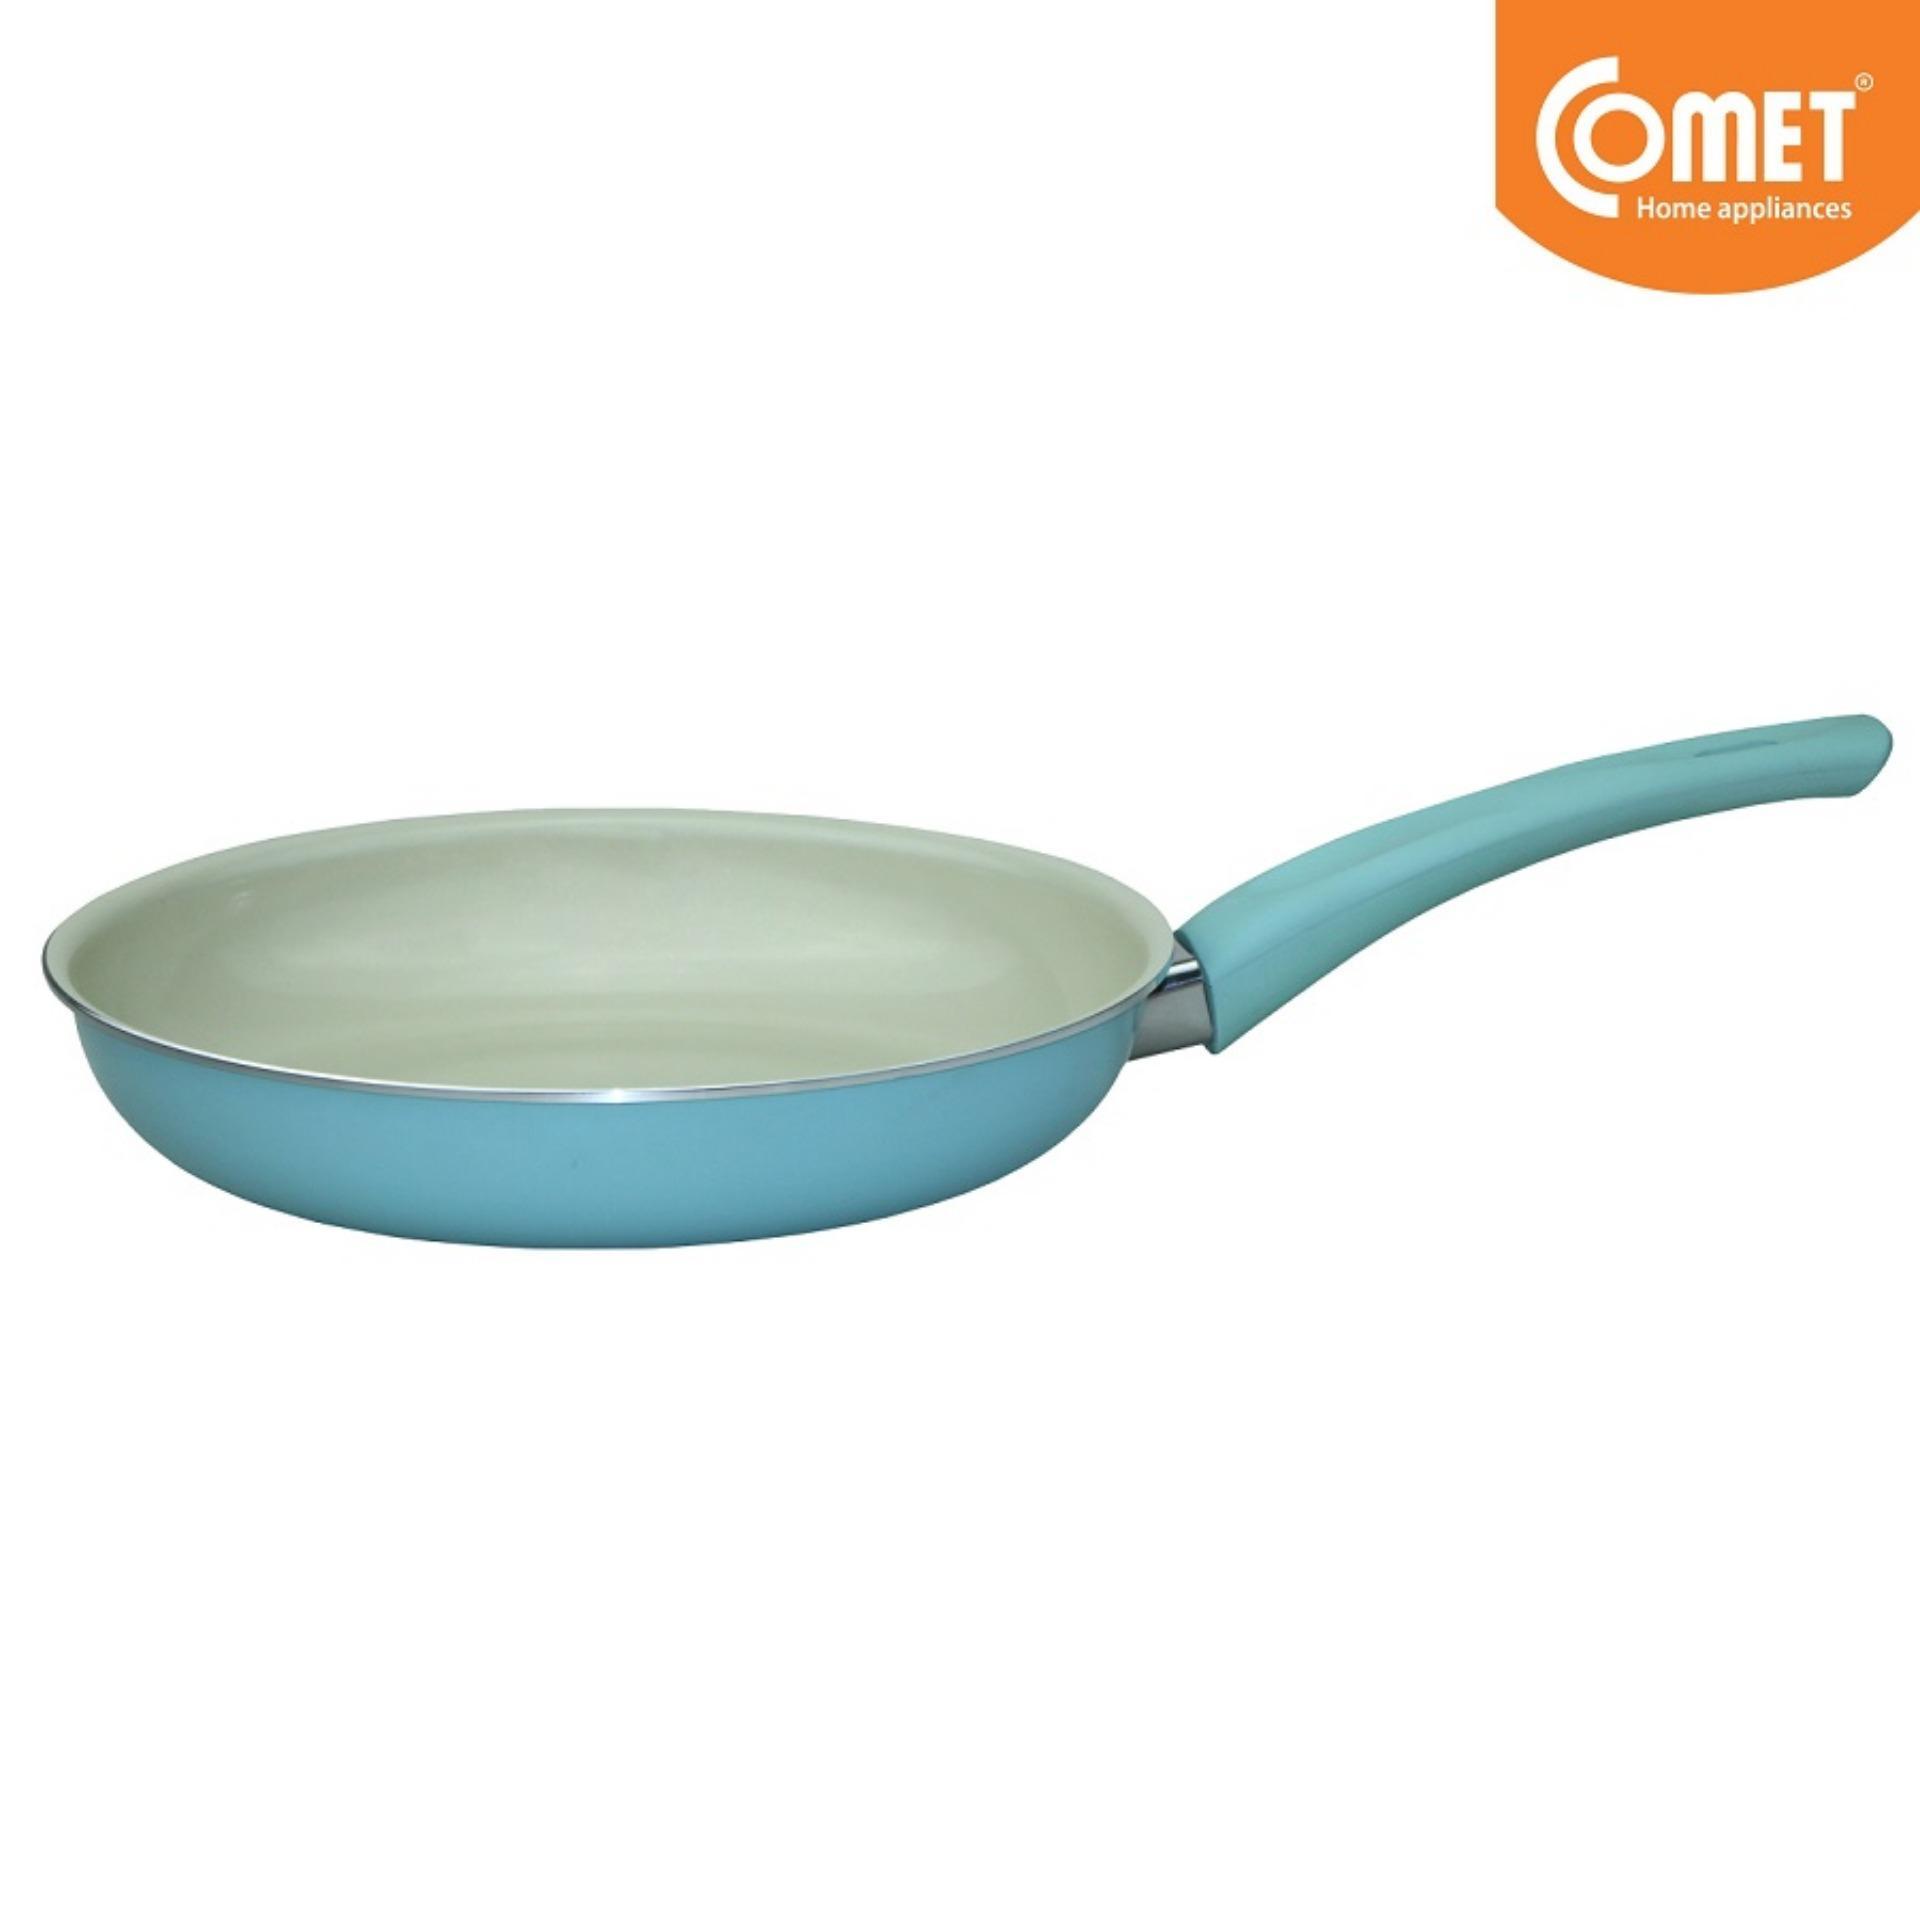 Chảo ceramic chống dính 24cm Comet CH11-24